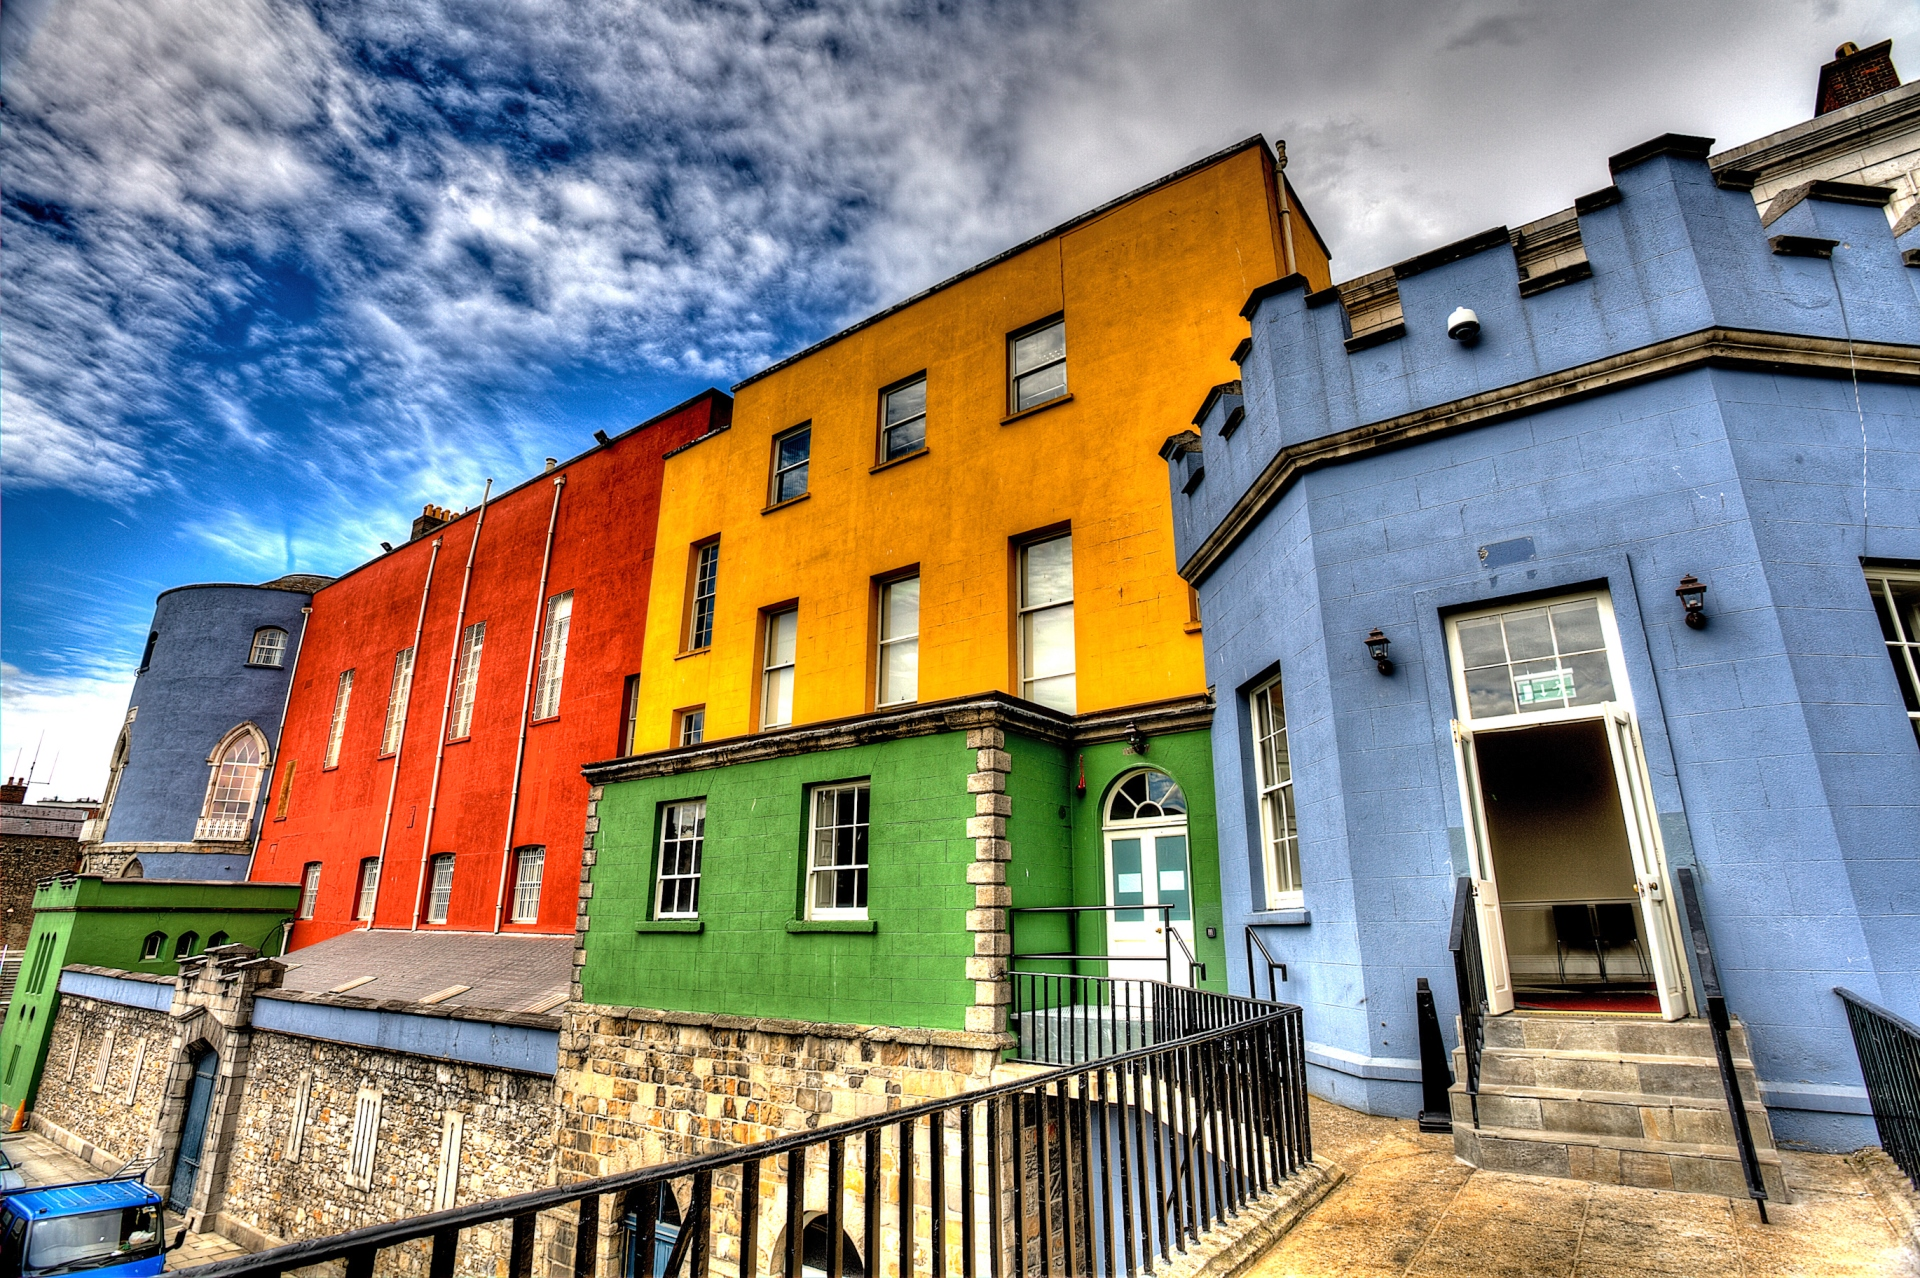 farbenfrohe Fassaden in Dublin